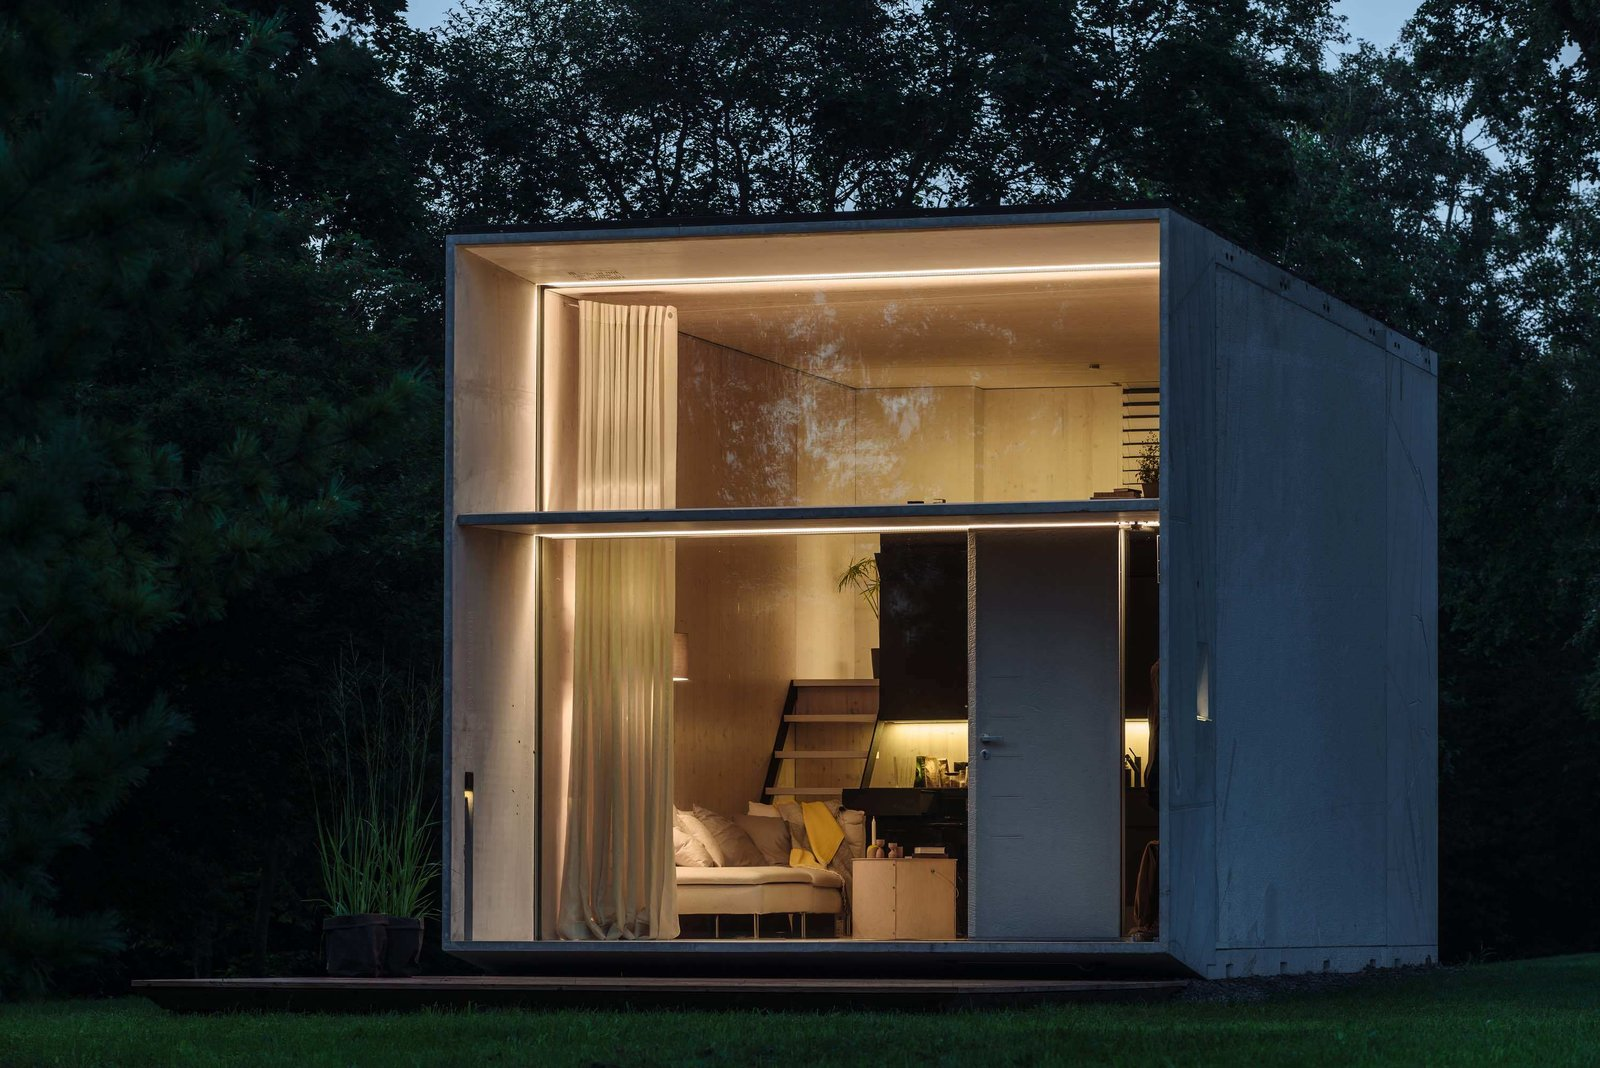 Kodasema Launches Four Minimalist Yet Cozy Tiny Houses